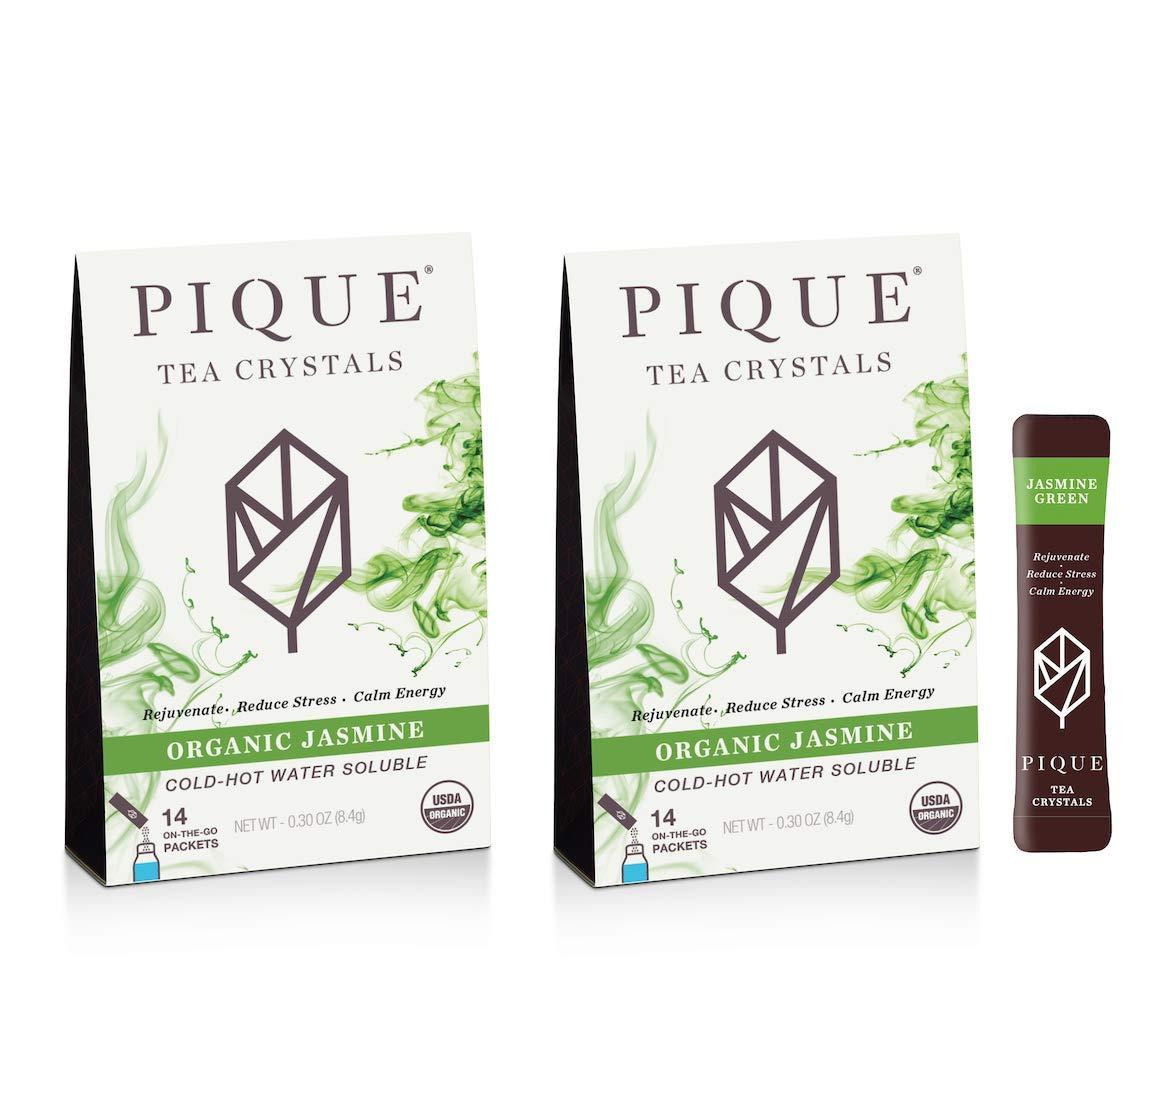 Pique Tea Organic Jasmine Green Tea Crystals - Gut Health, Fasting, Calm - 28 Single Serve Sticks (Pack of 2)